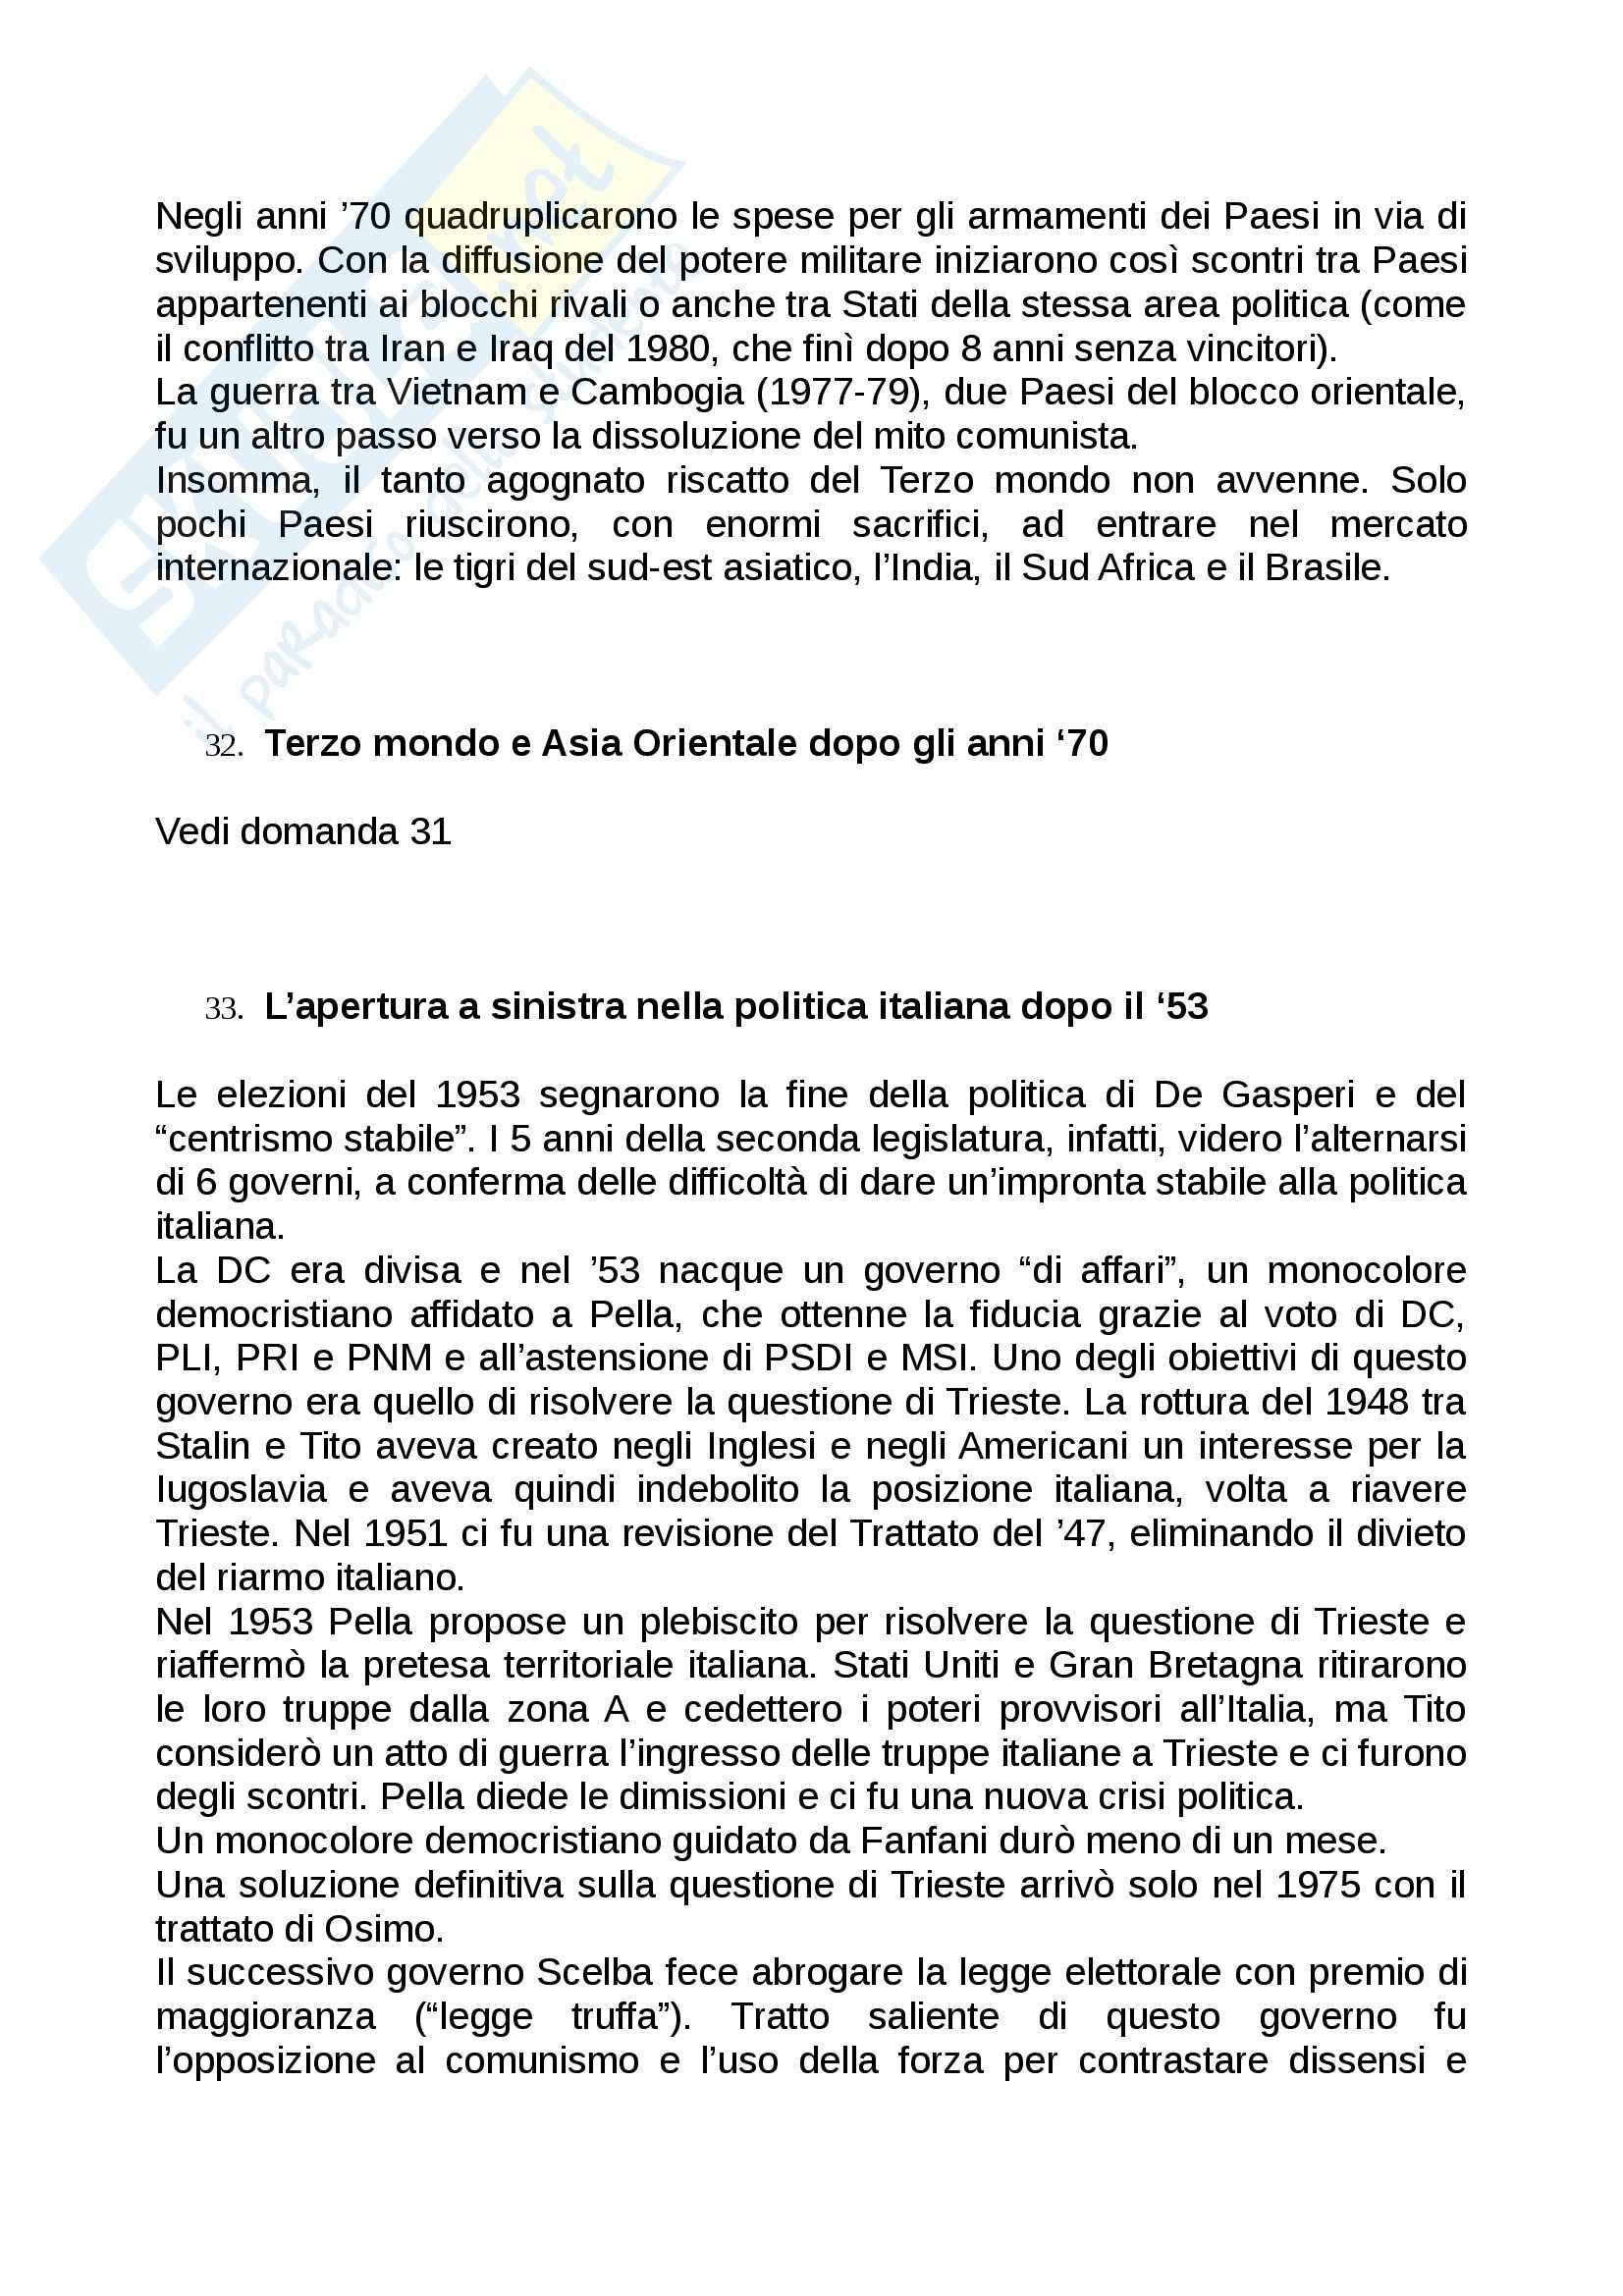 Domande e Risposte, Storia Contemporanea Pag. 41